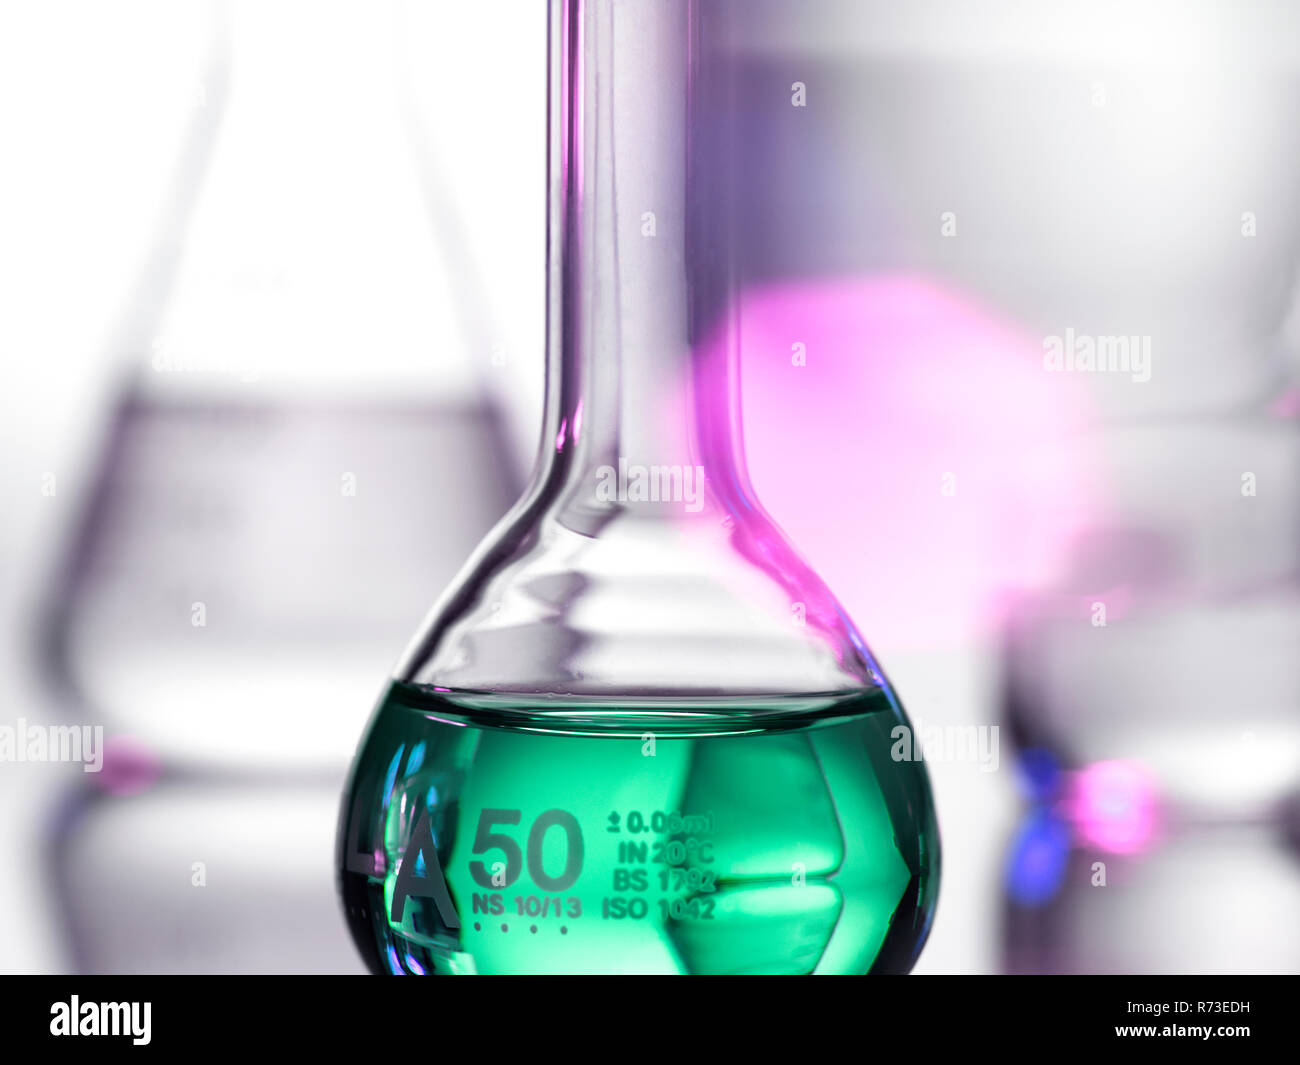 Laboratory beakers containing chemical formulas - Stock Image